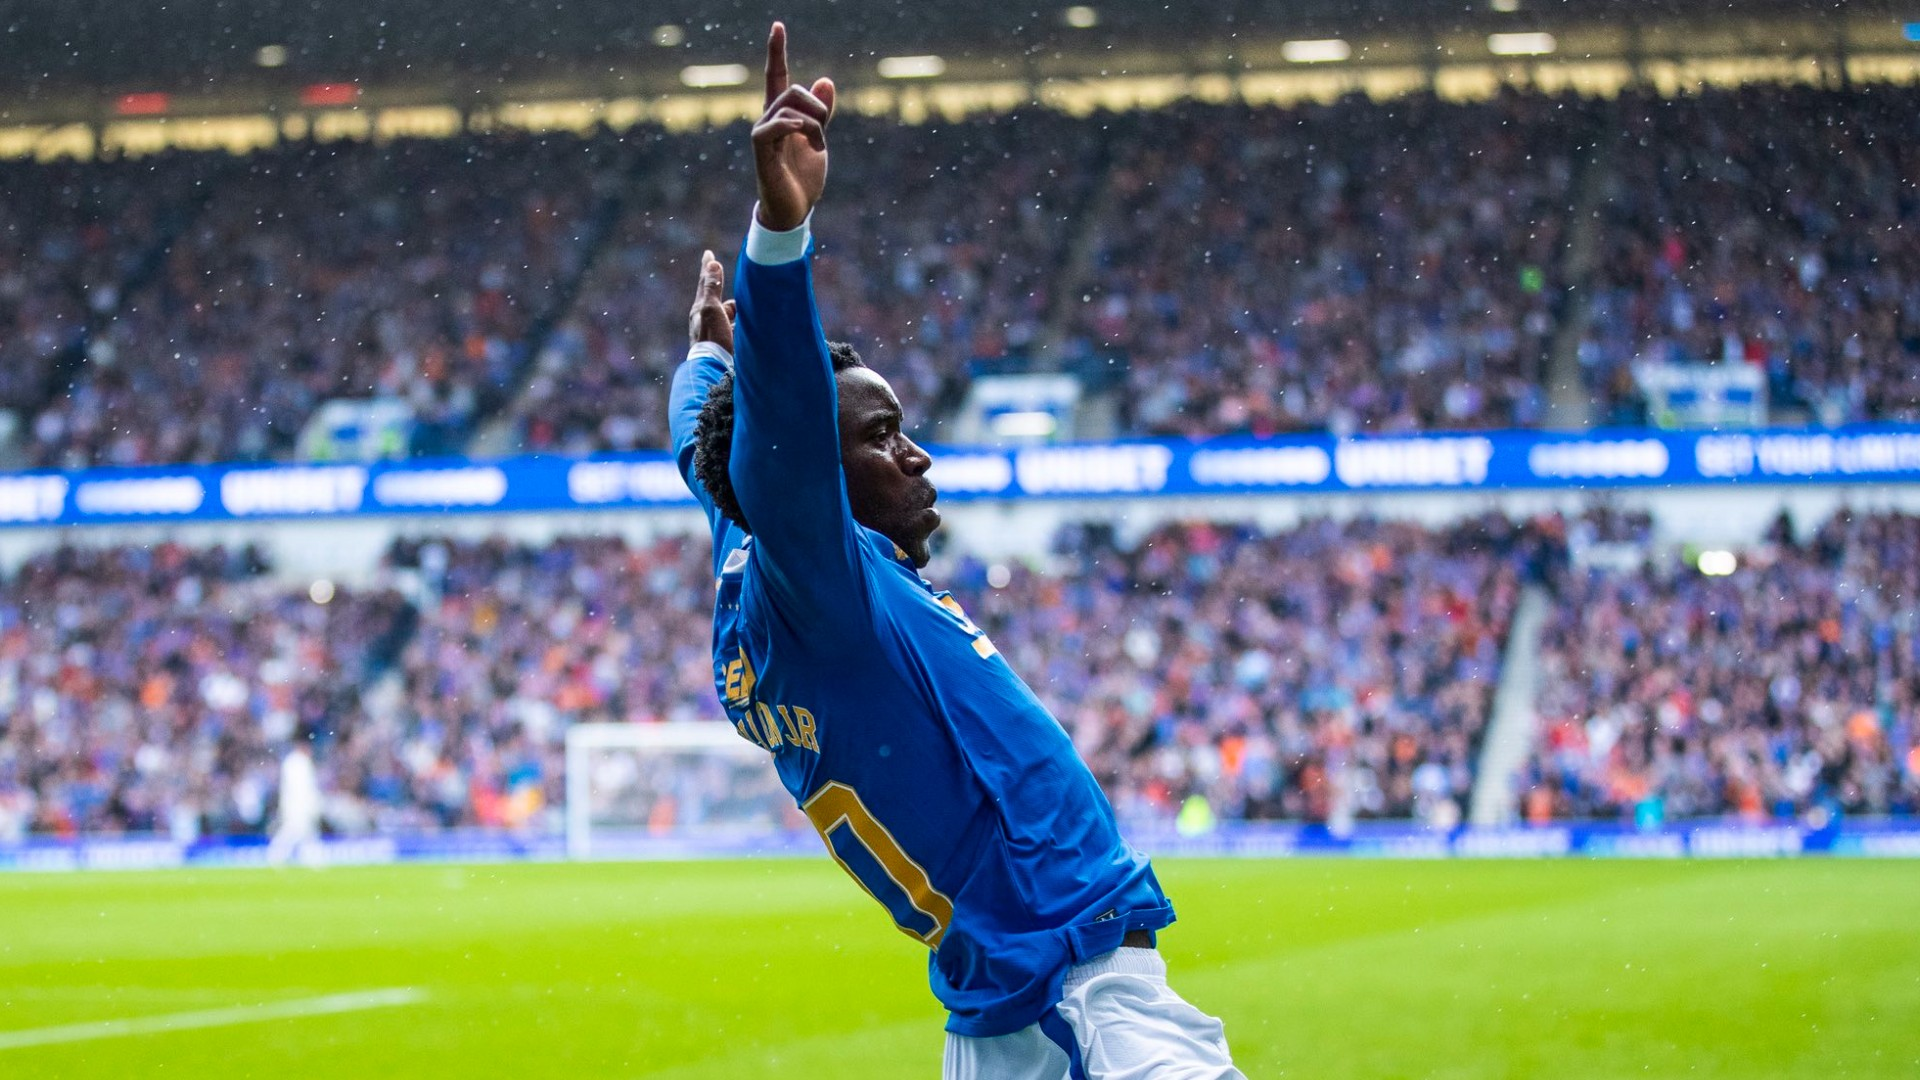 'He looked lively' – Rangers' Gerrard hails Sakala after Motherwell goal